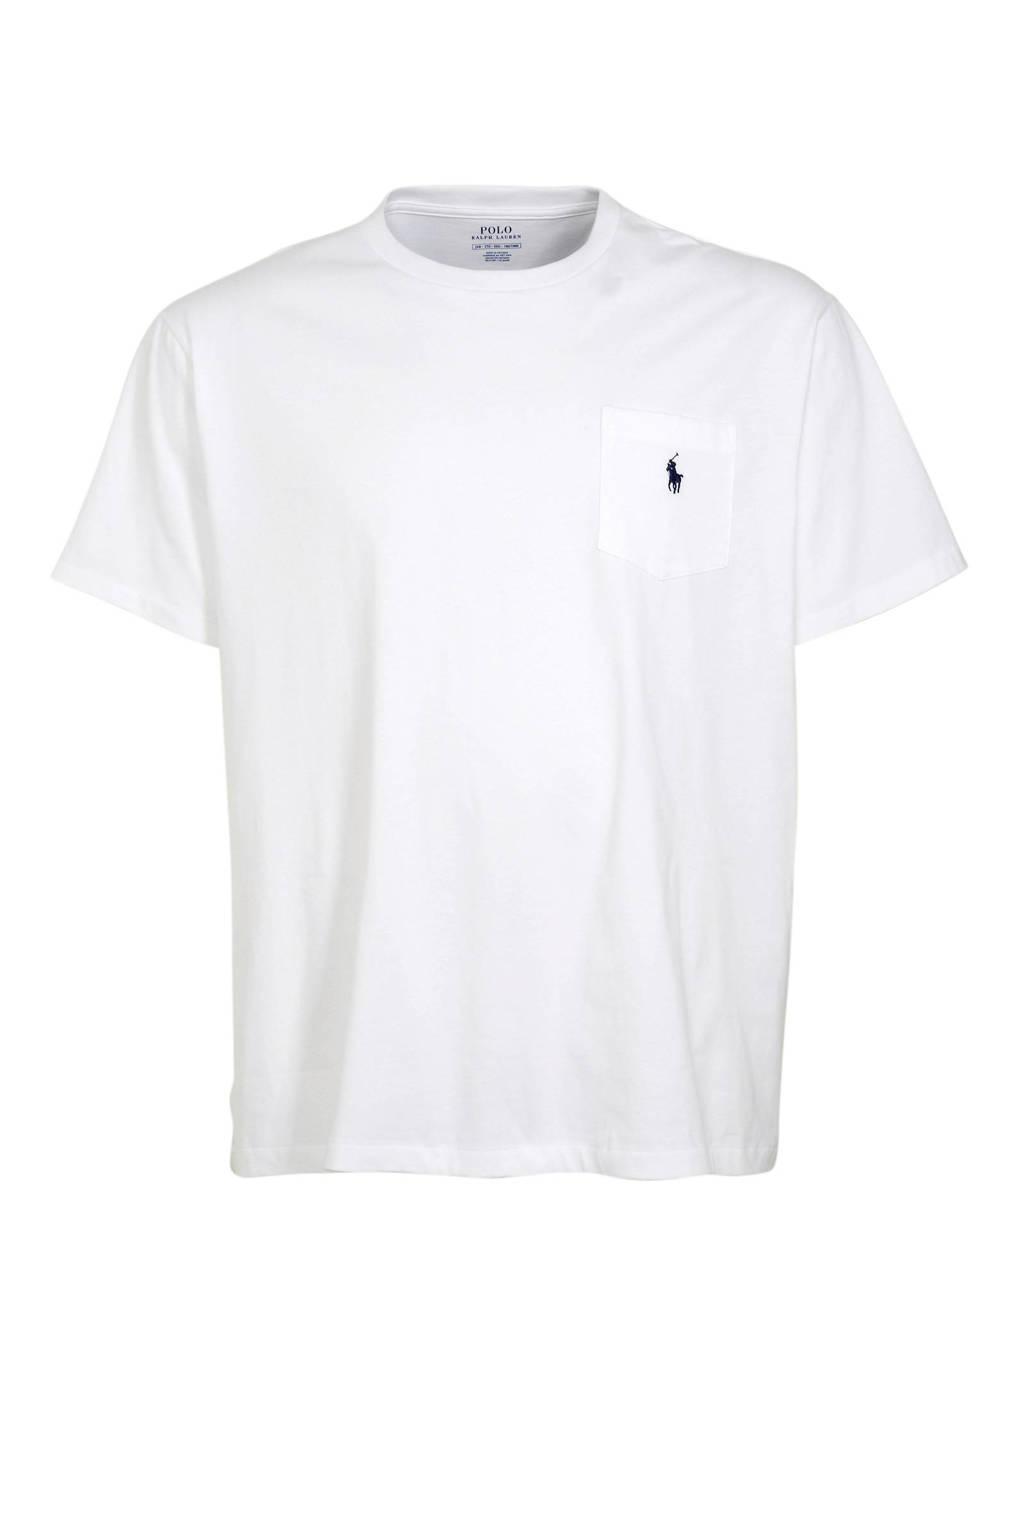 POLO Ralph Lauren Big & Tall +size T-shirt wit, Wit